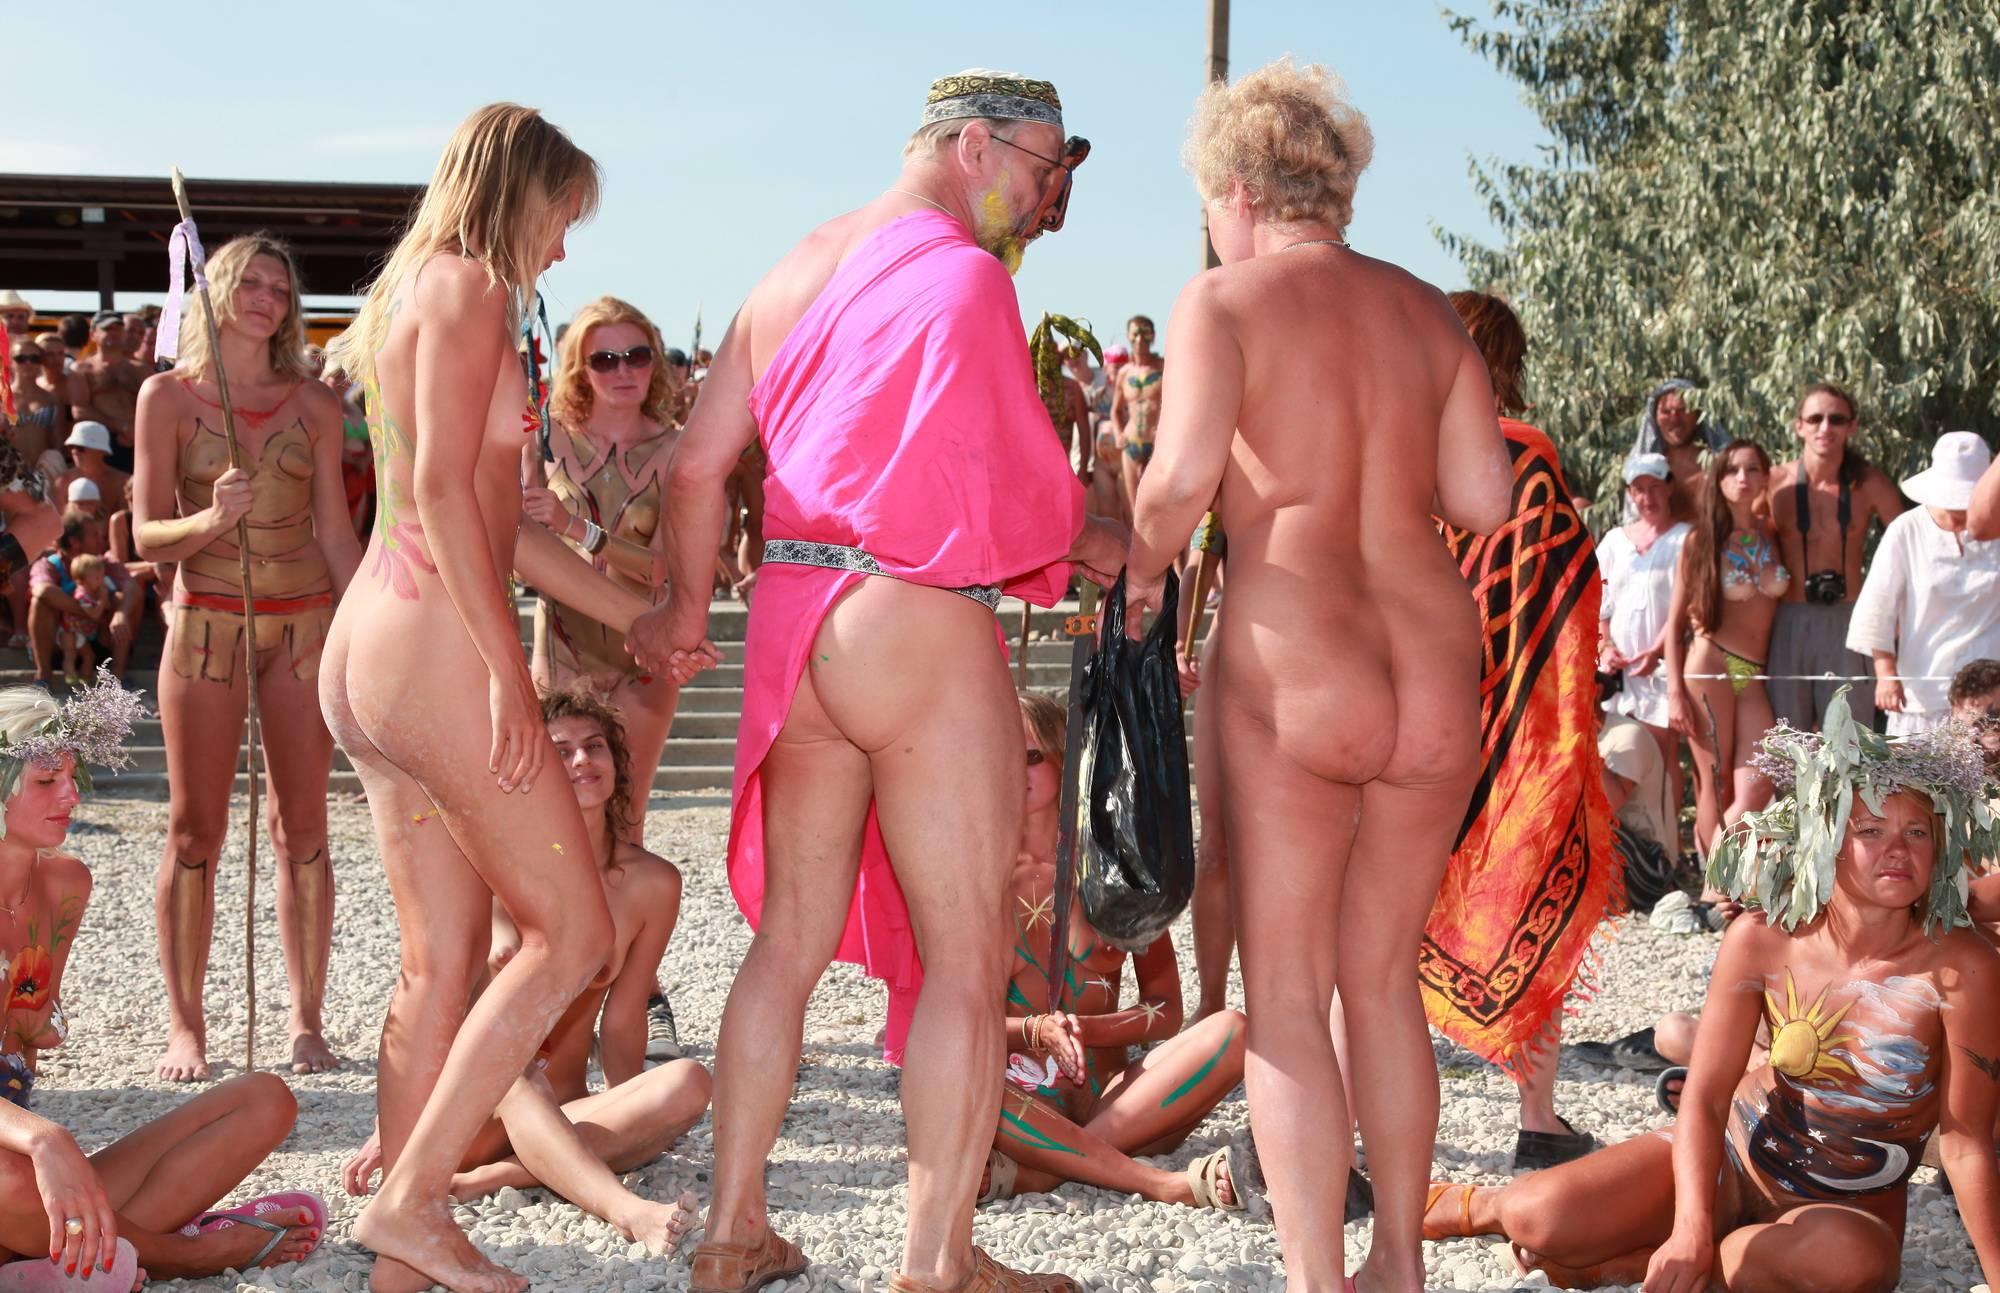 Nudist Pictures Neptune Bodypaint Lineup - 2